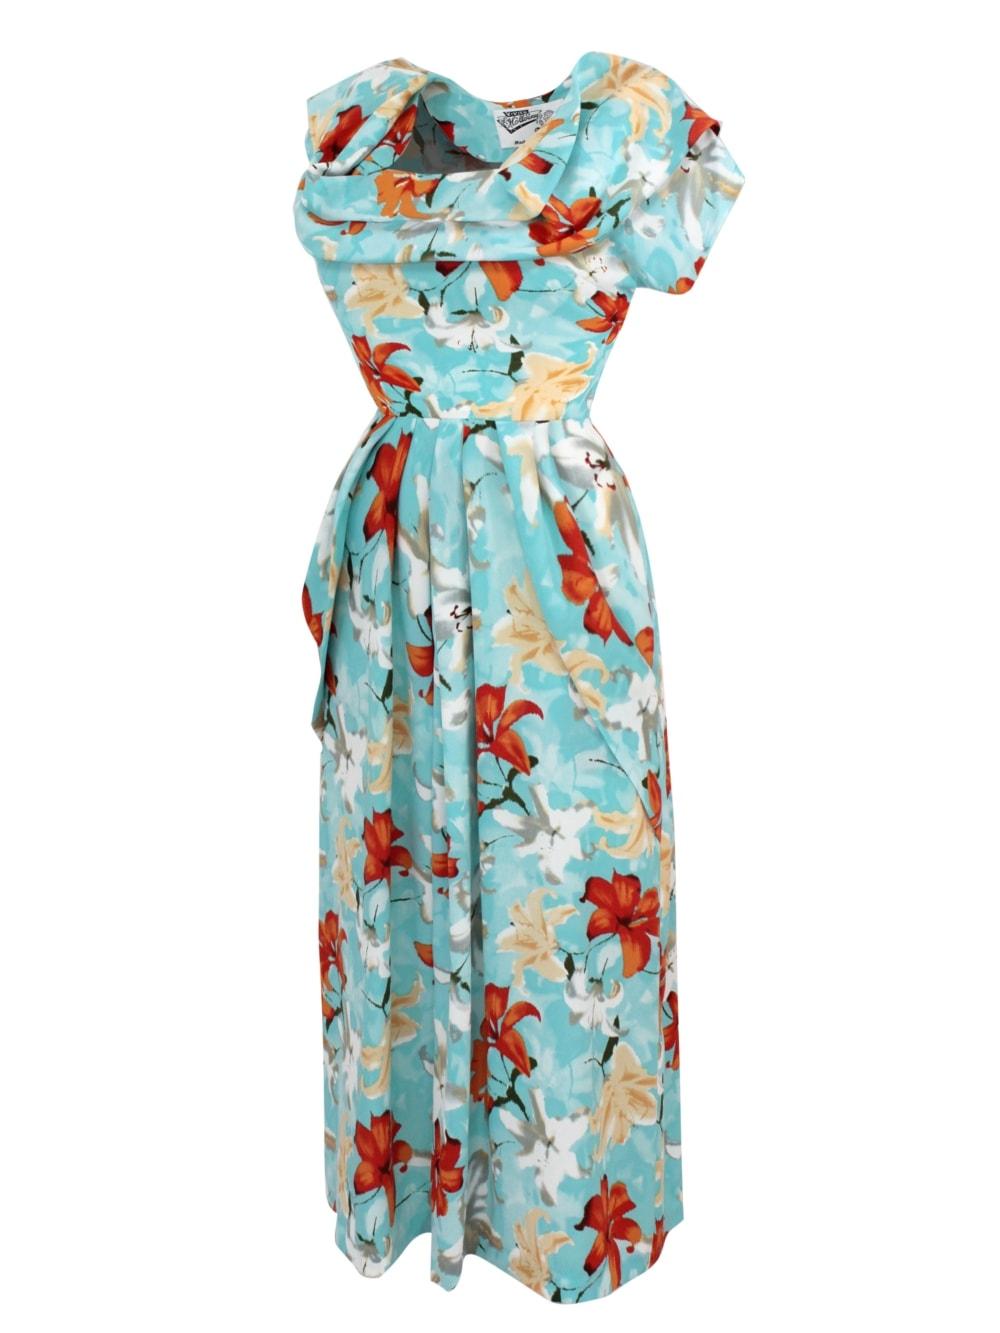 e03242b867d13 1940s Dress Lana Hermonie Sky From Vivien of Holloway